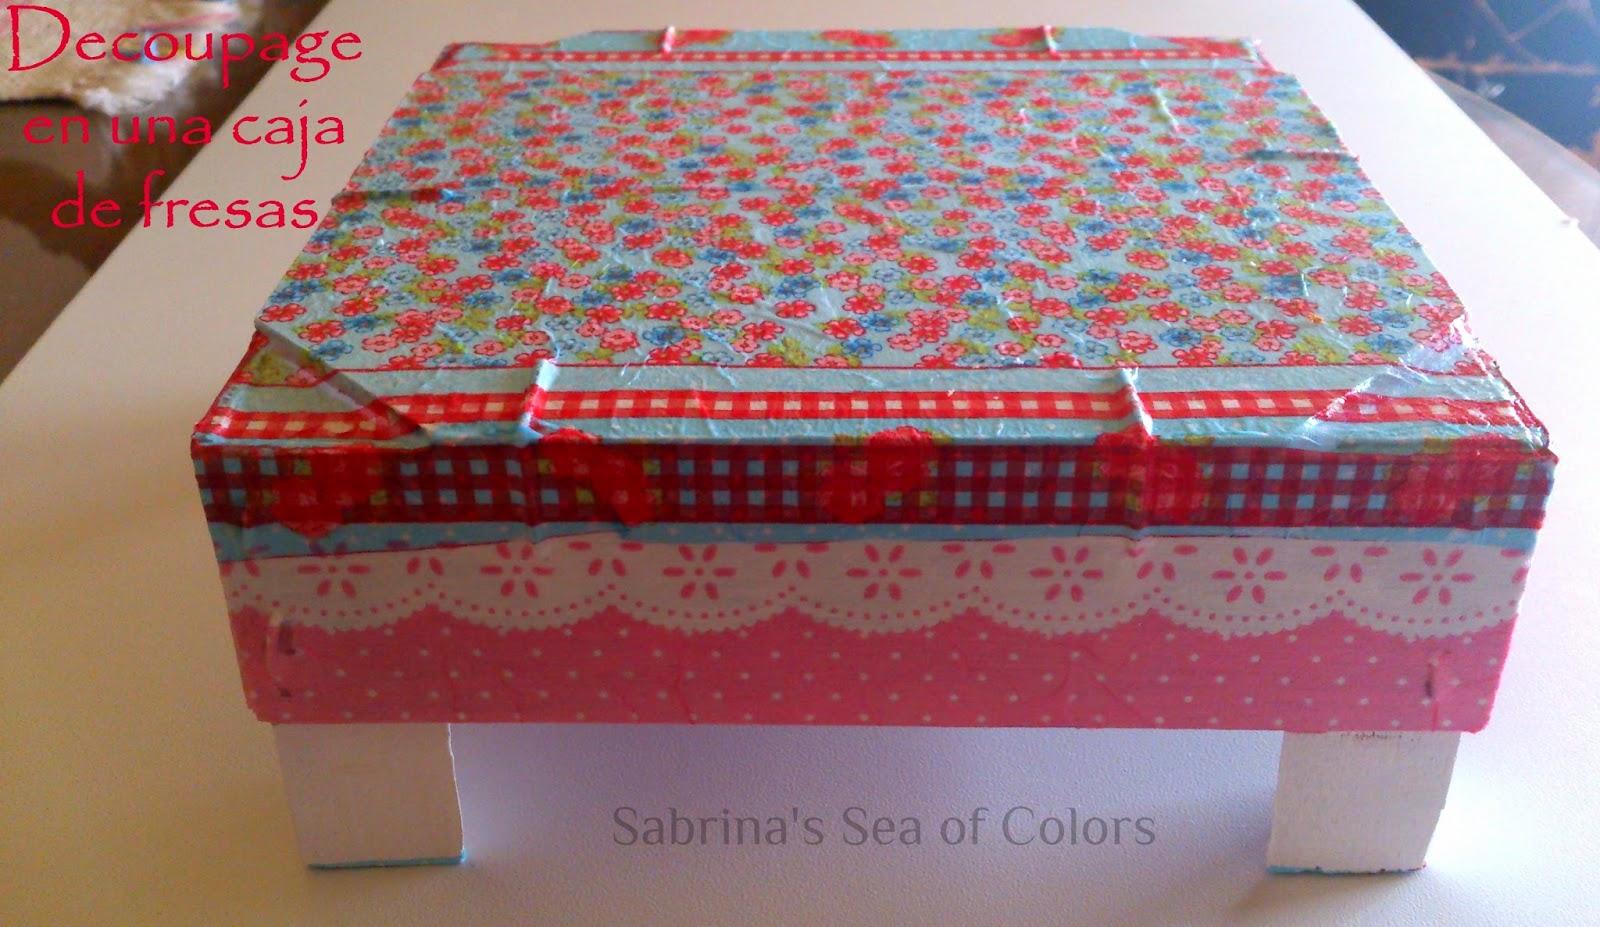 Decoupage en una caja de fresas